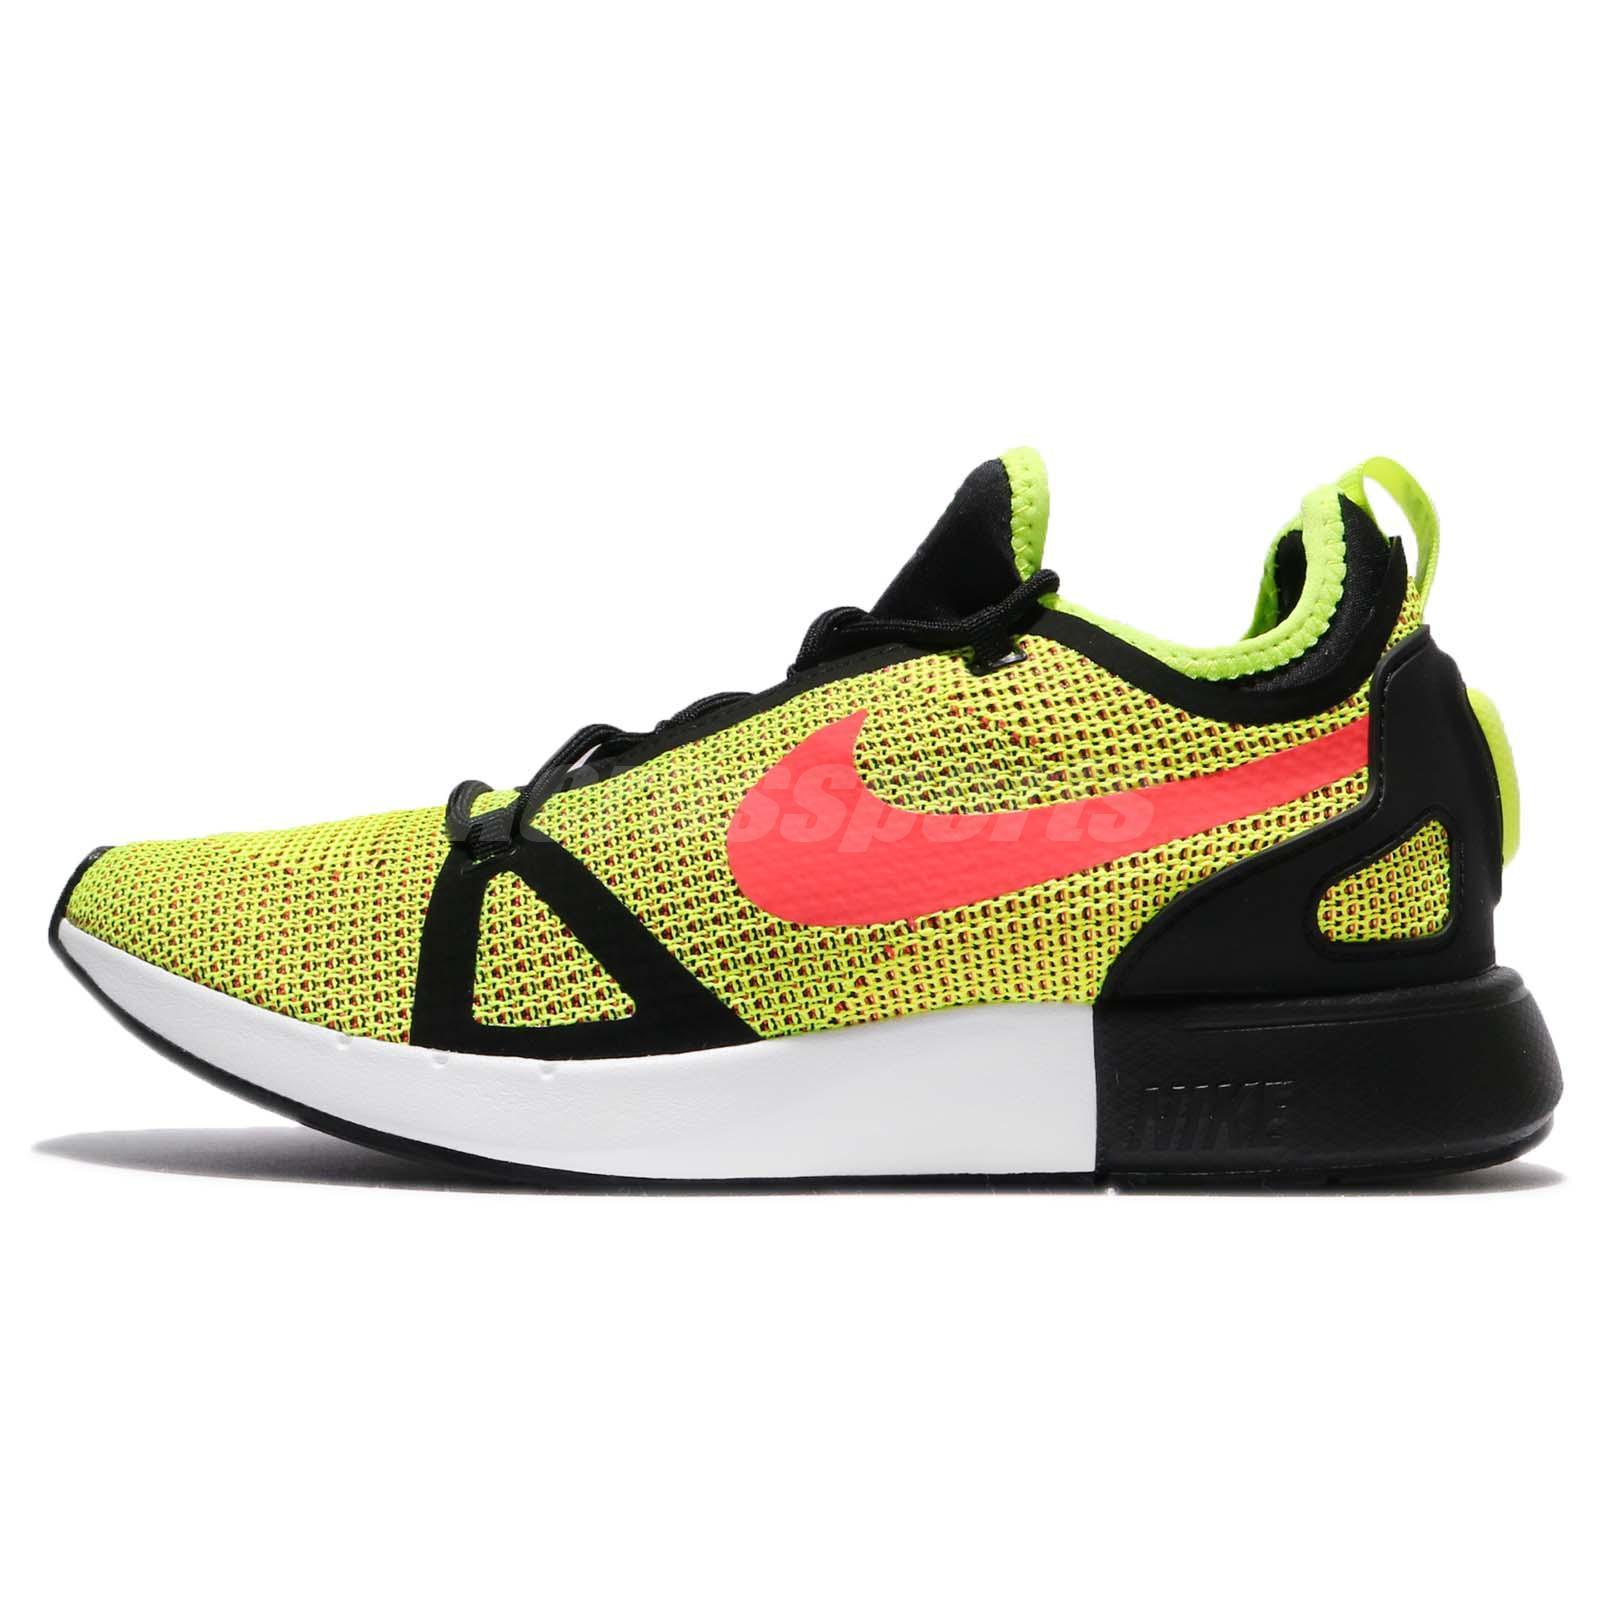 Nike Duel Racer Volt Bright Crimson Black 918228-700 Msrp 0 Ae